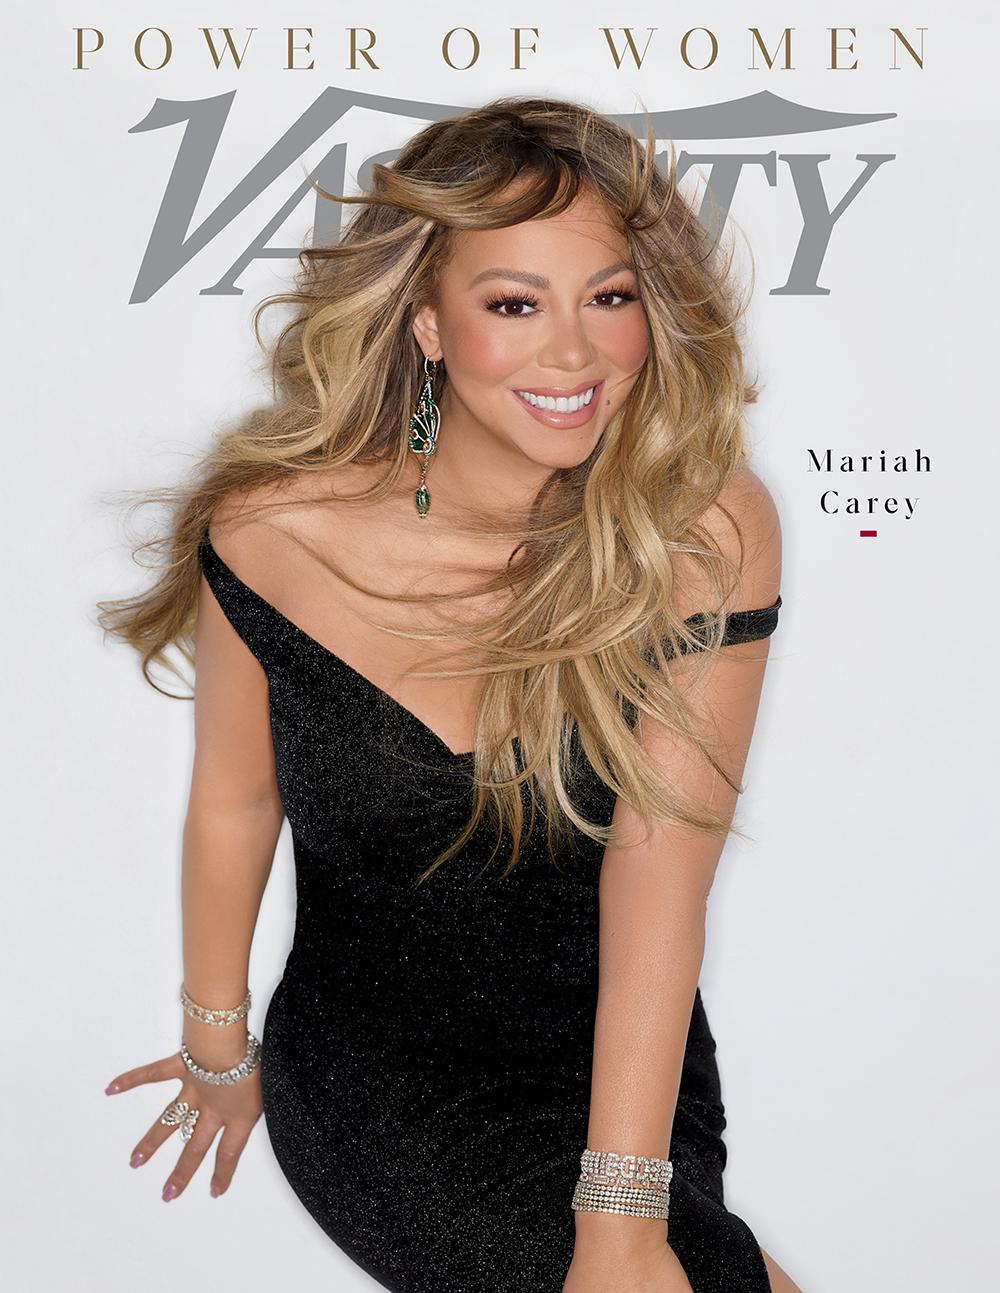 Mariah Carey On Camp Mariah S Direct Impact On People S Lives Variety In 2021 Mariah Carey Mariah Carey Photos Mariah